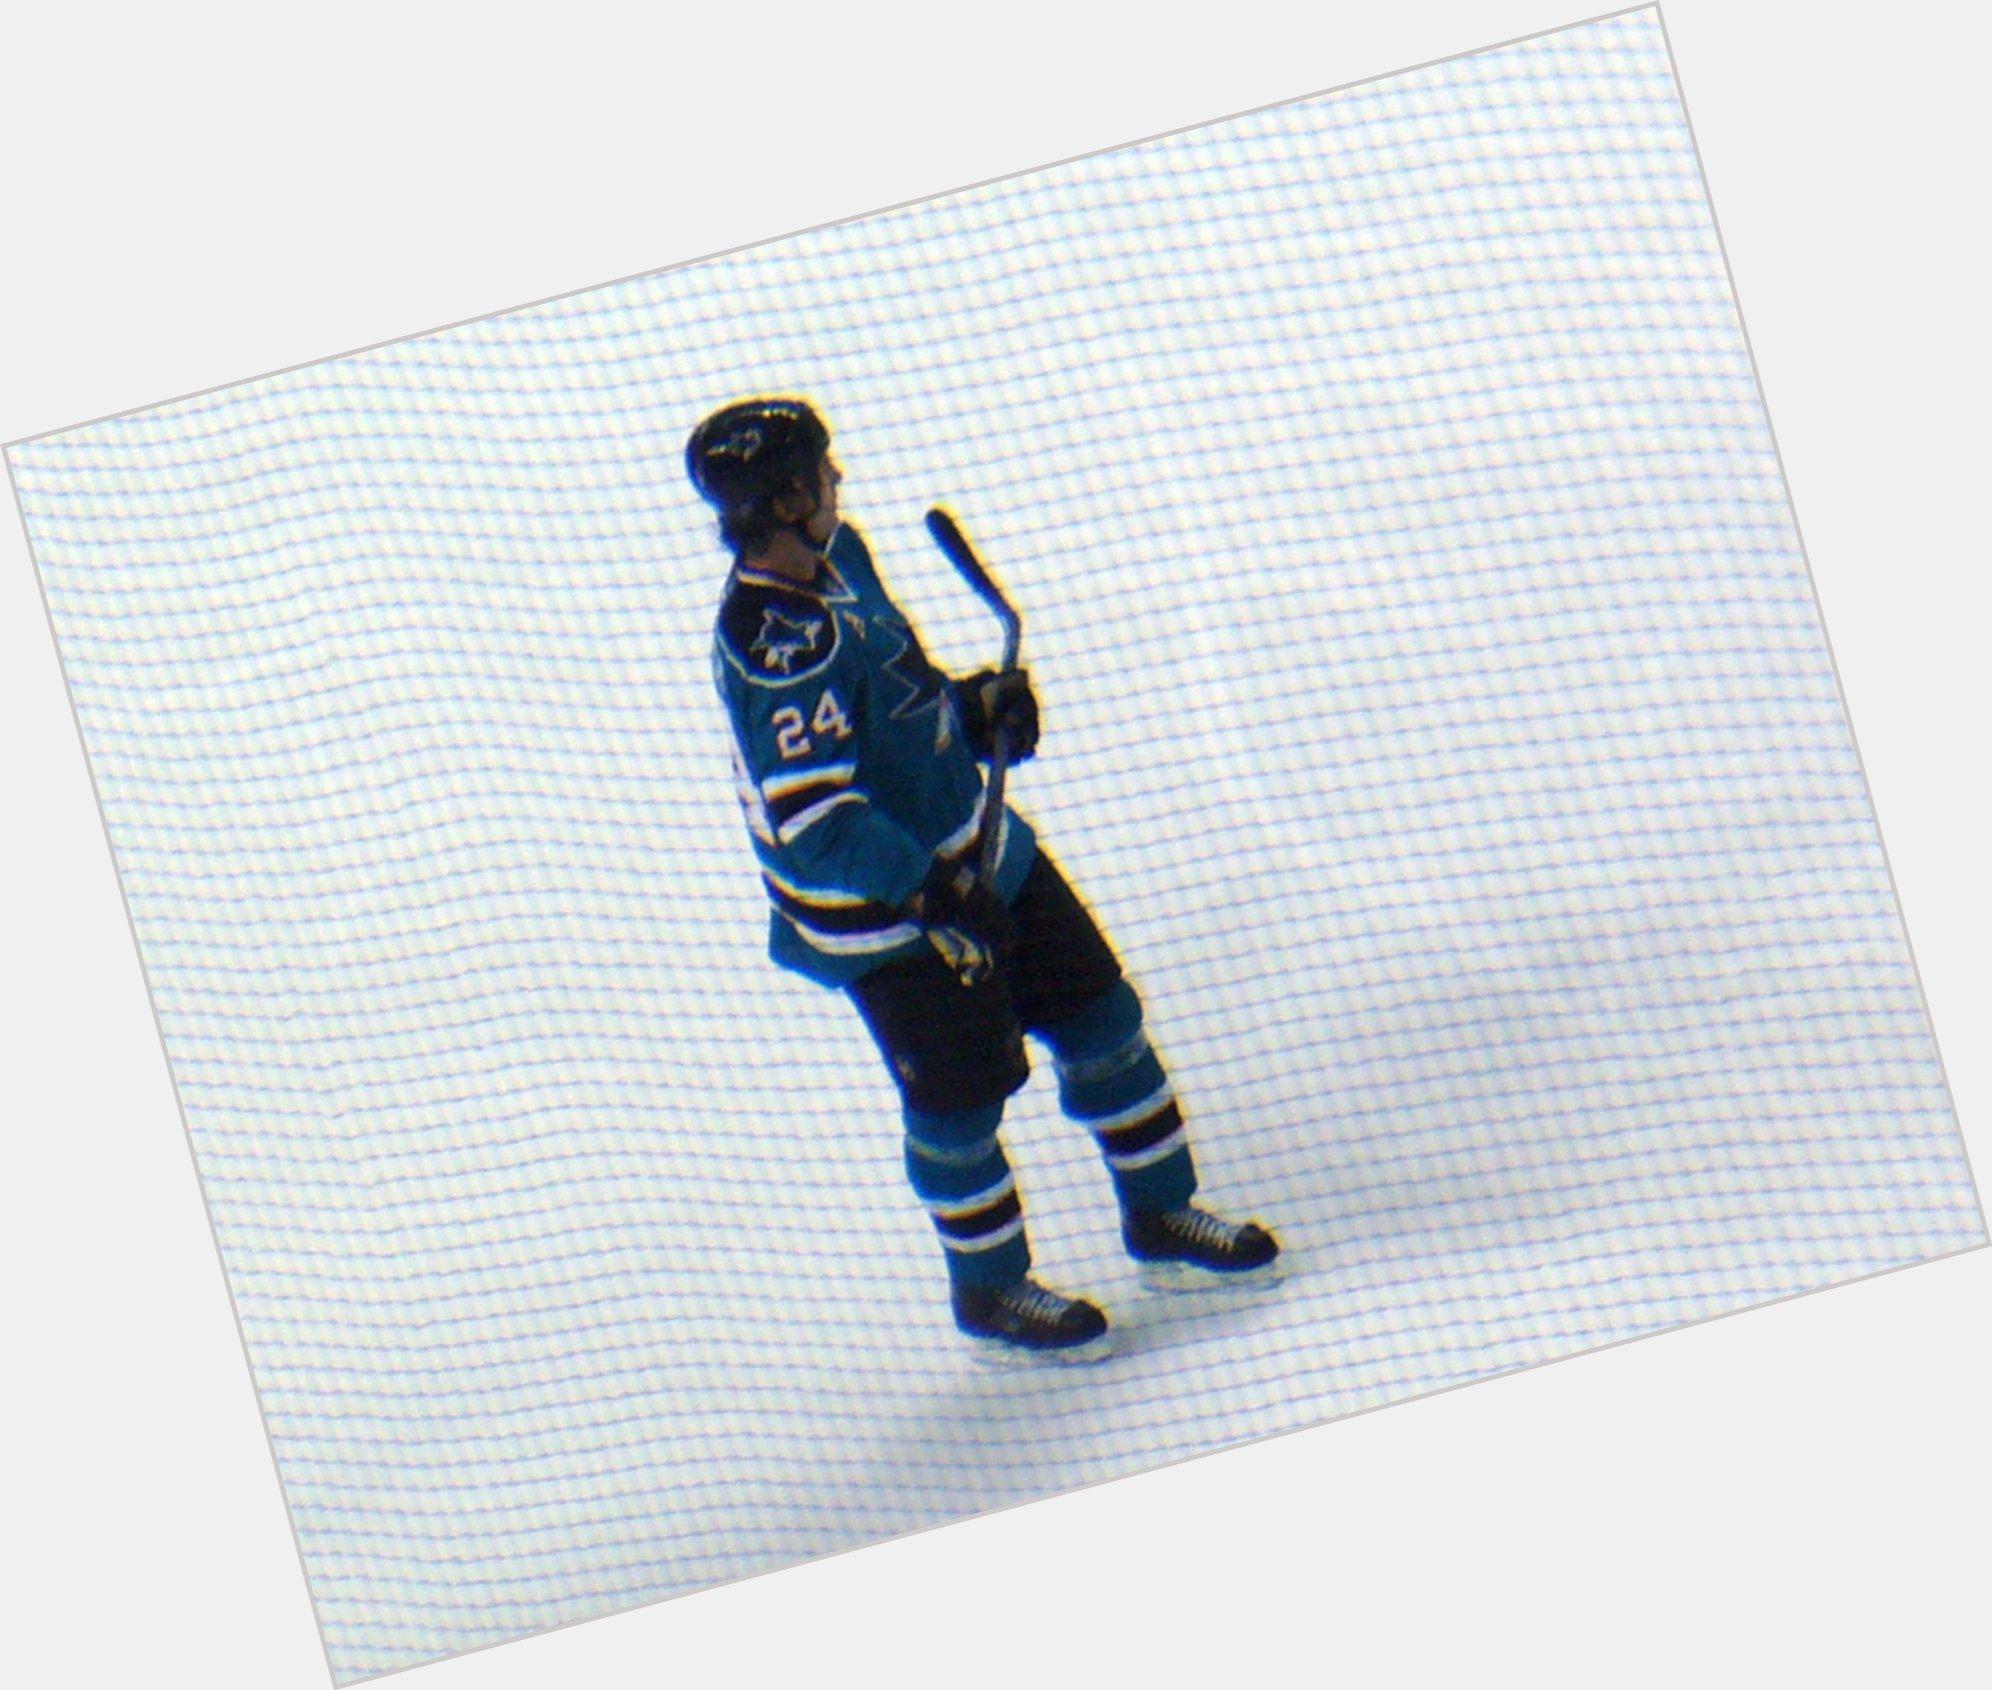 Sandis Ozolinsh new pic 10.jpg